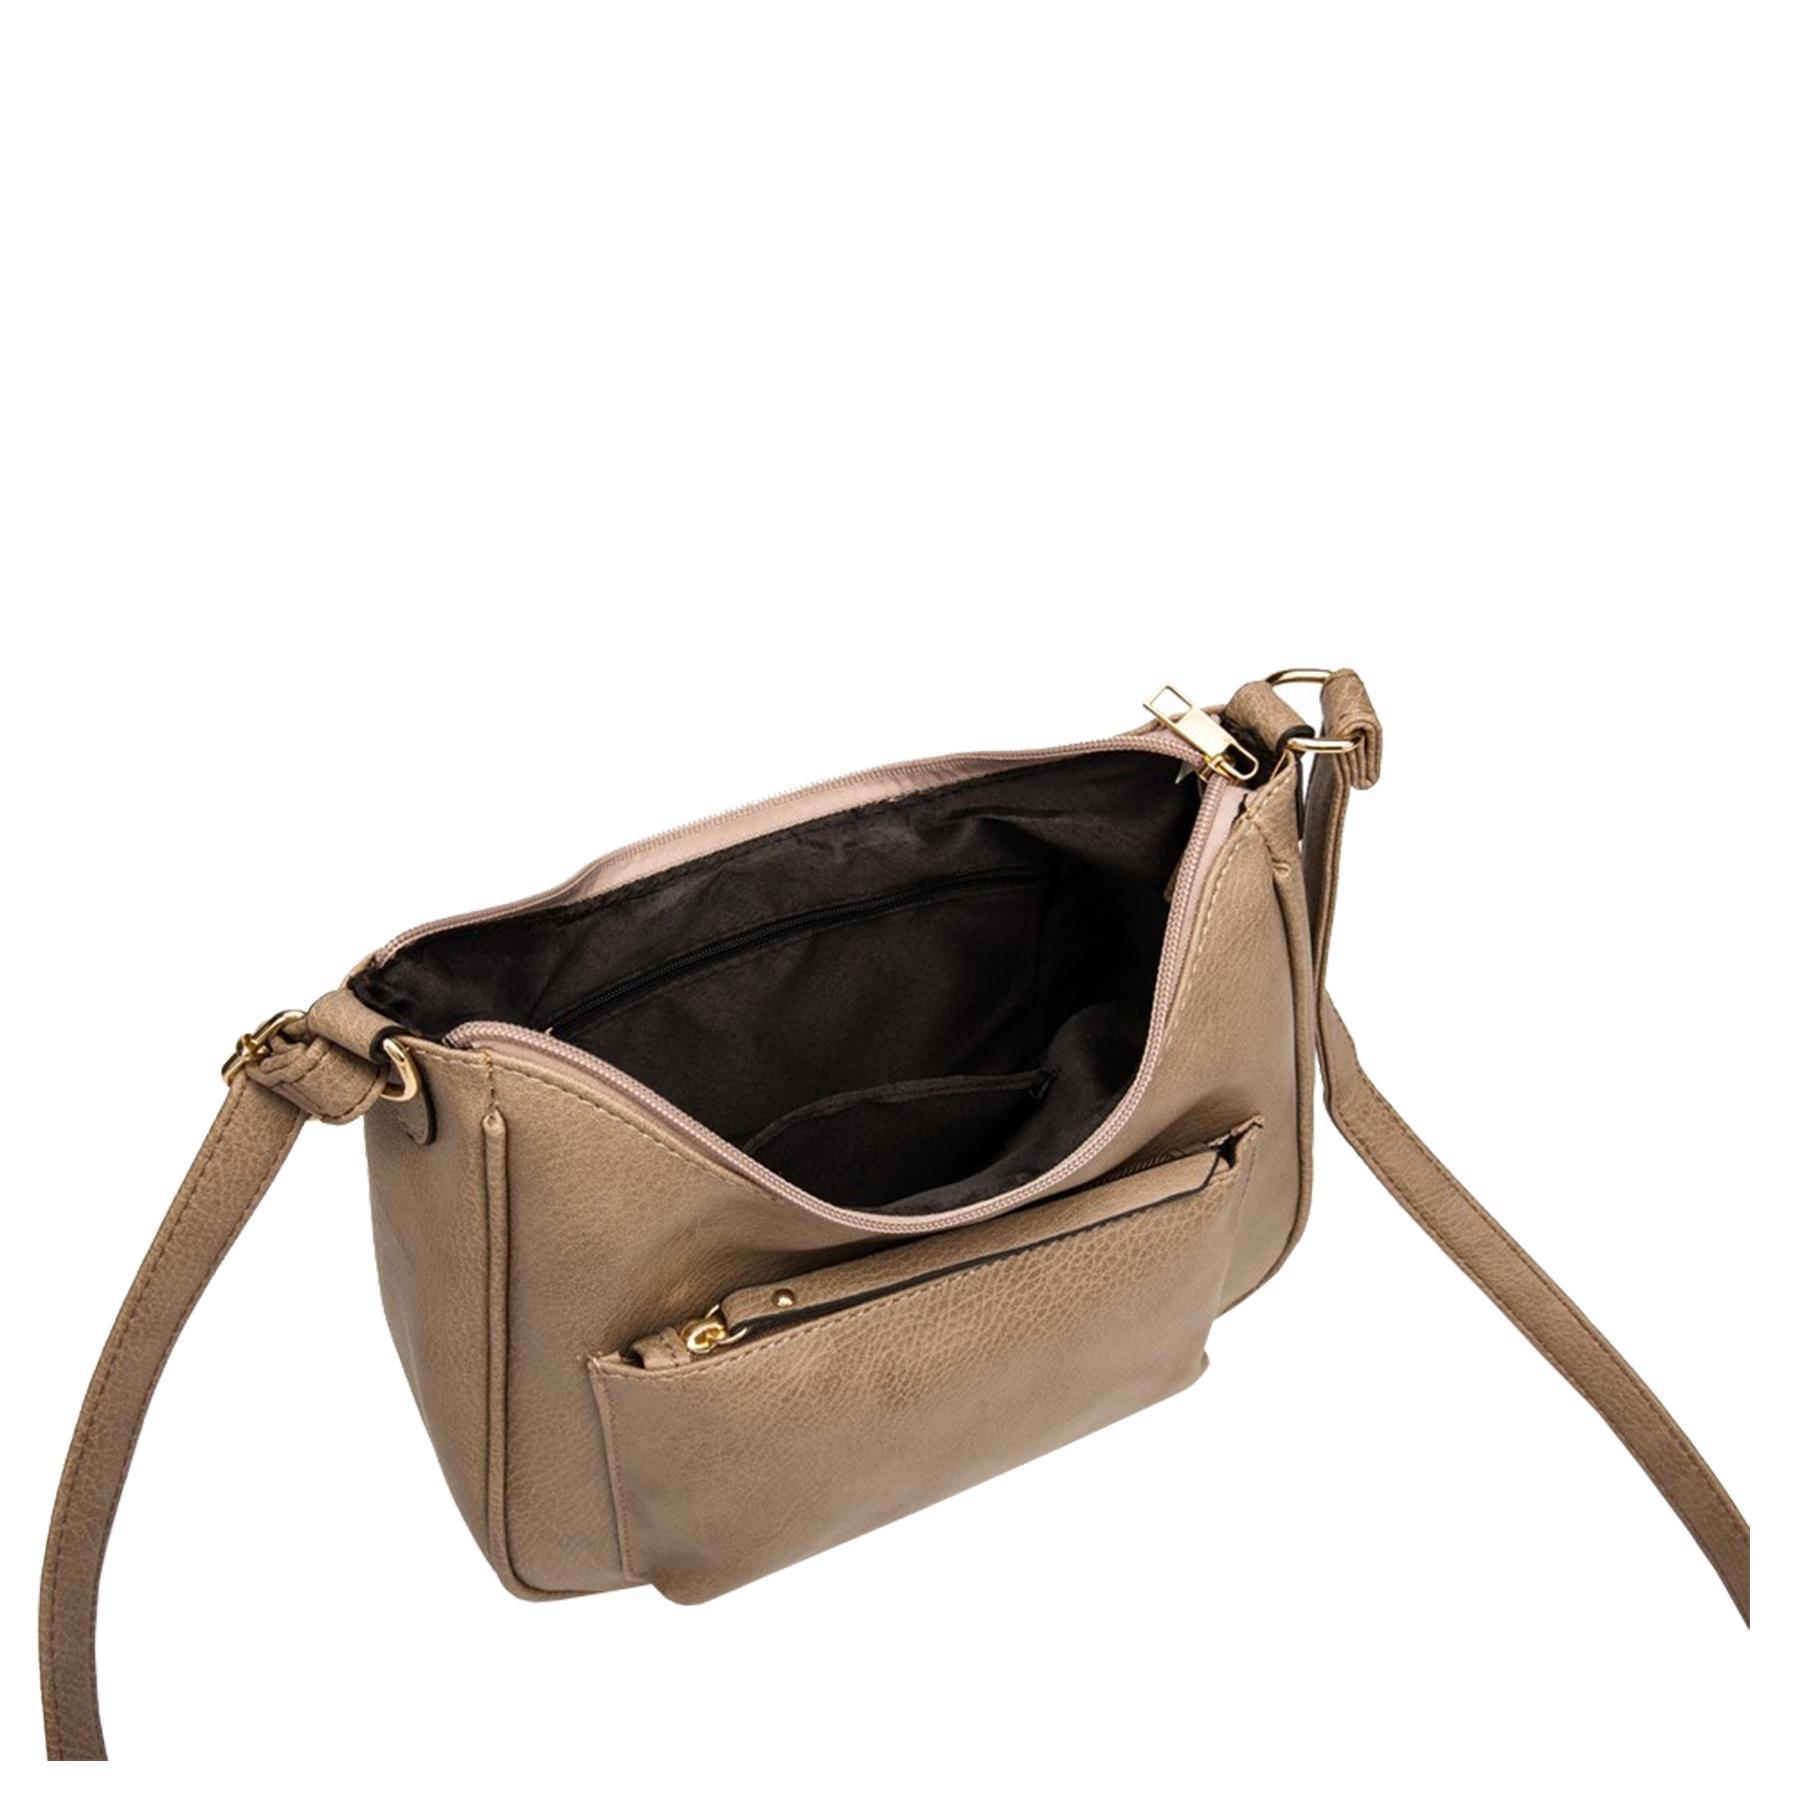 New-Soft-Synthetic-Leather-Front-Pocket-Ladies-Casual-Crossbody-Bag-Handbag thumbnail 10